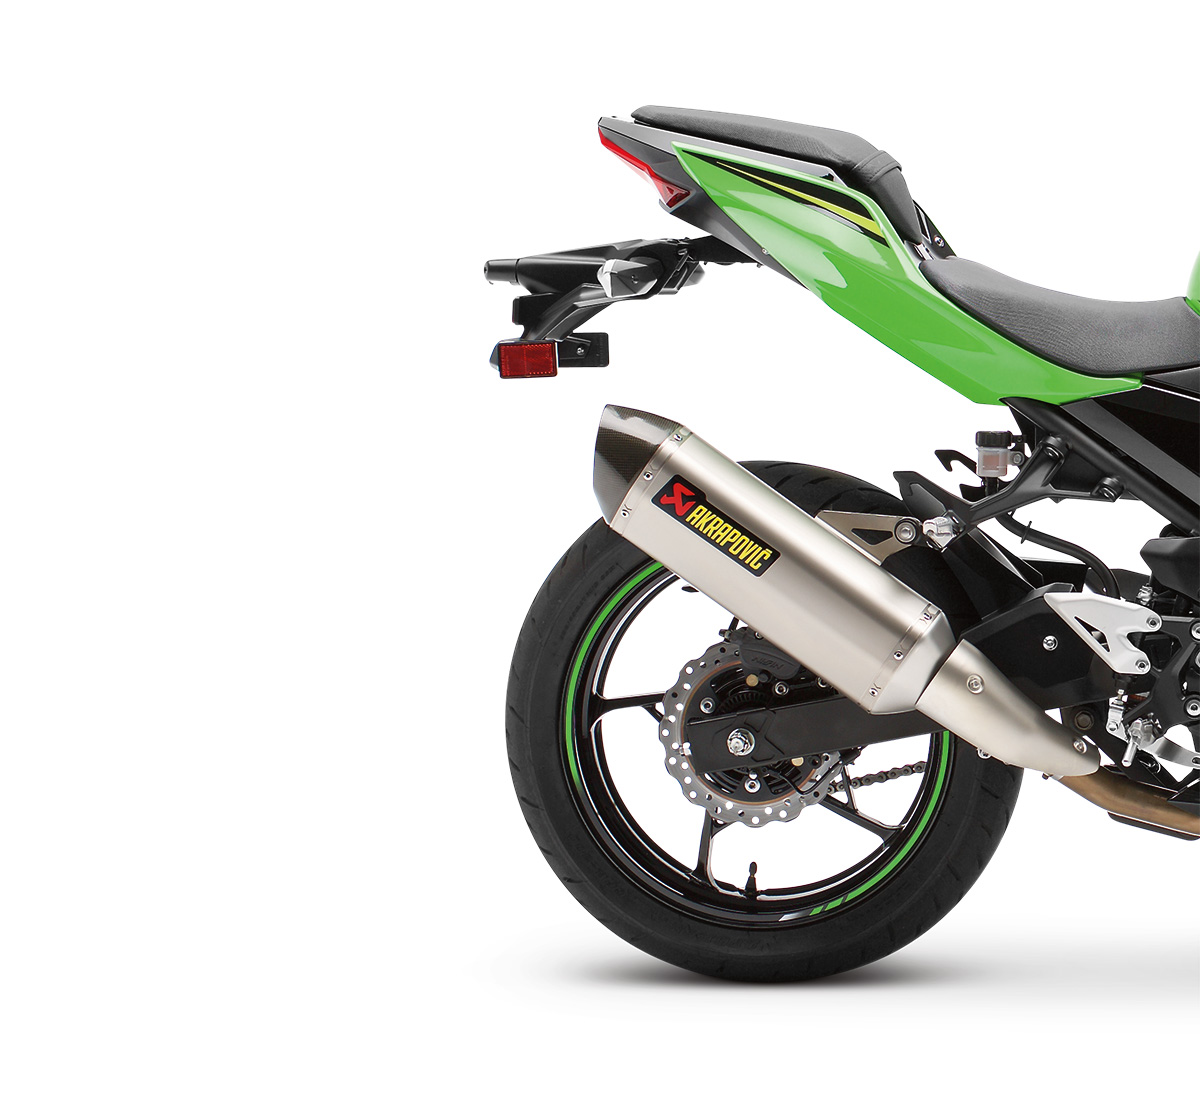 Motorcycle Ninja® 400 / Z400 Akrapovic Slip-On Exhaust